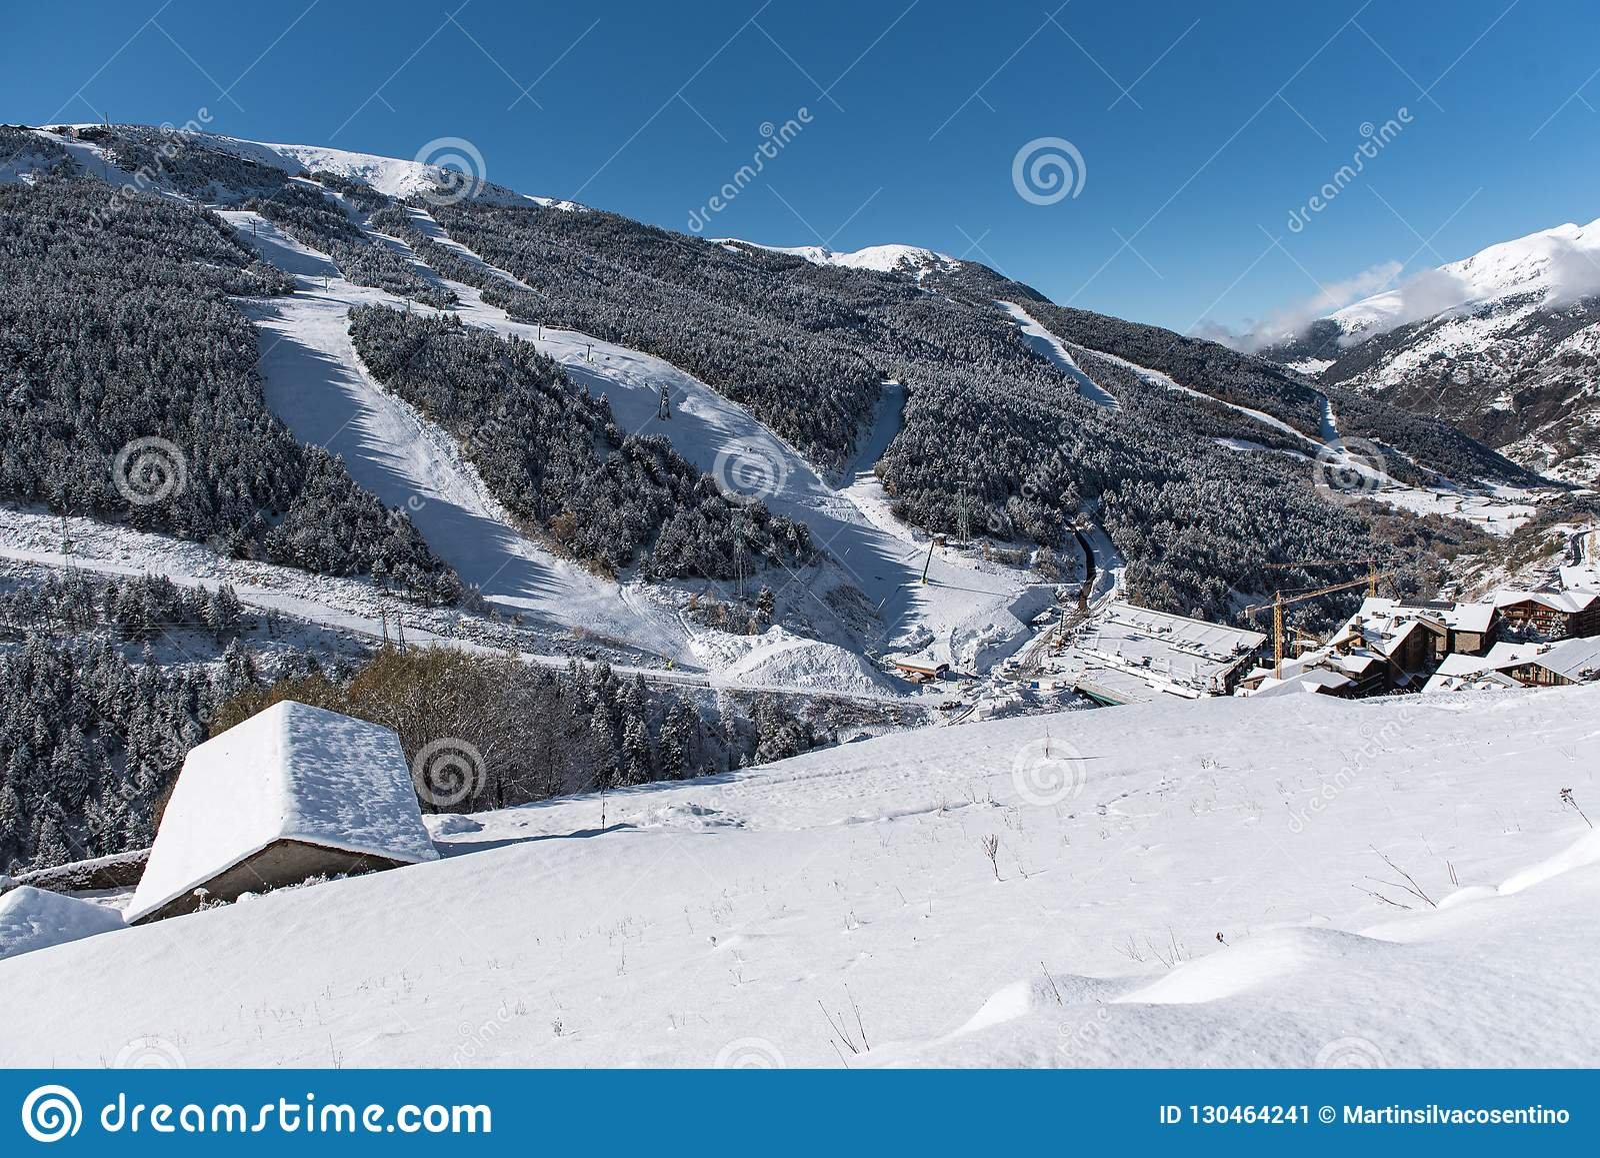 Soldeu, Canillo, Ανδόρα σε ένα πρωί φθινοπώρου στις πρώτες χιονοπτώσεις του της εποχής Μπορείτε να δείτε σχεδόν ολοκληρωμένος τις